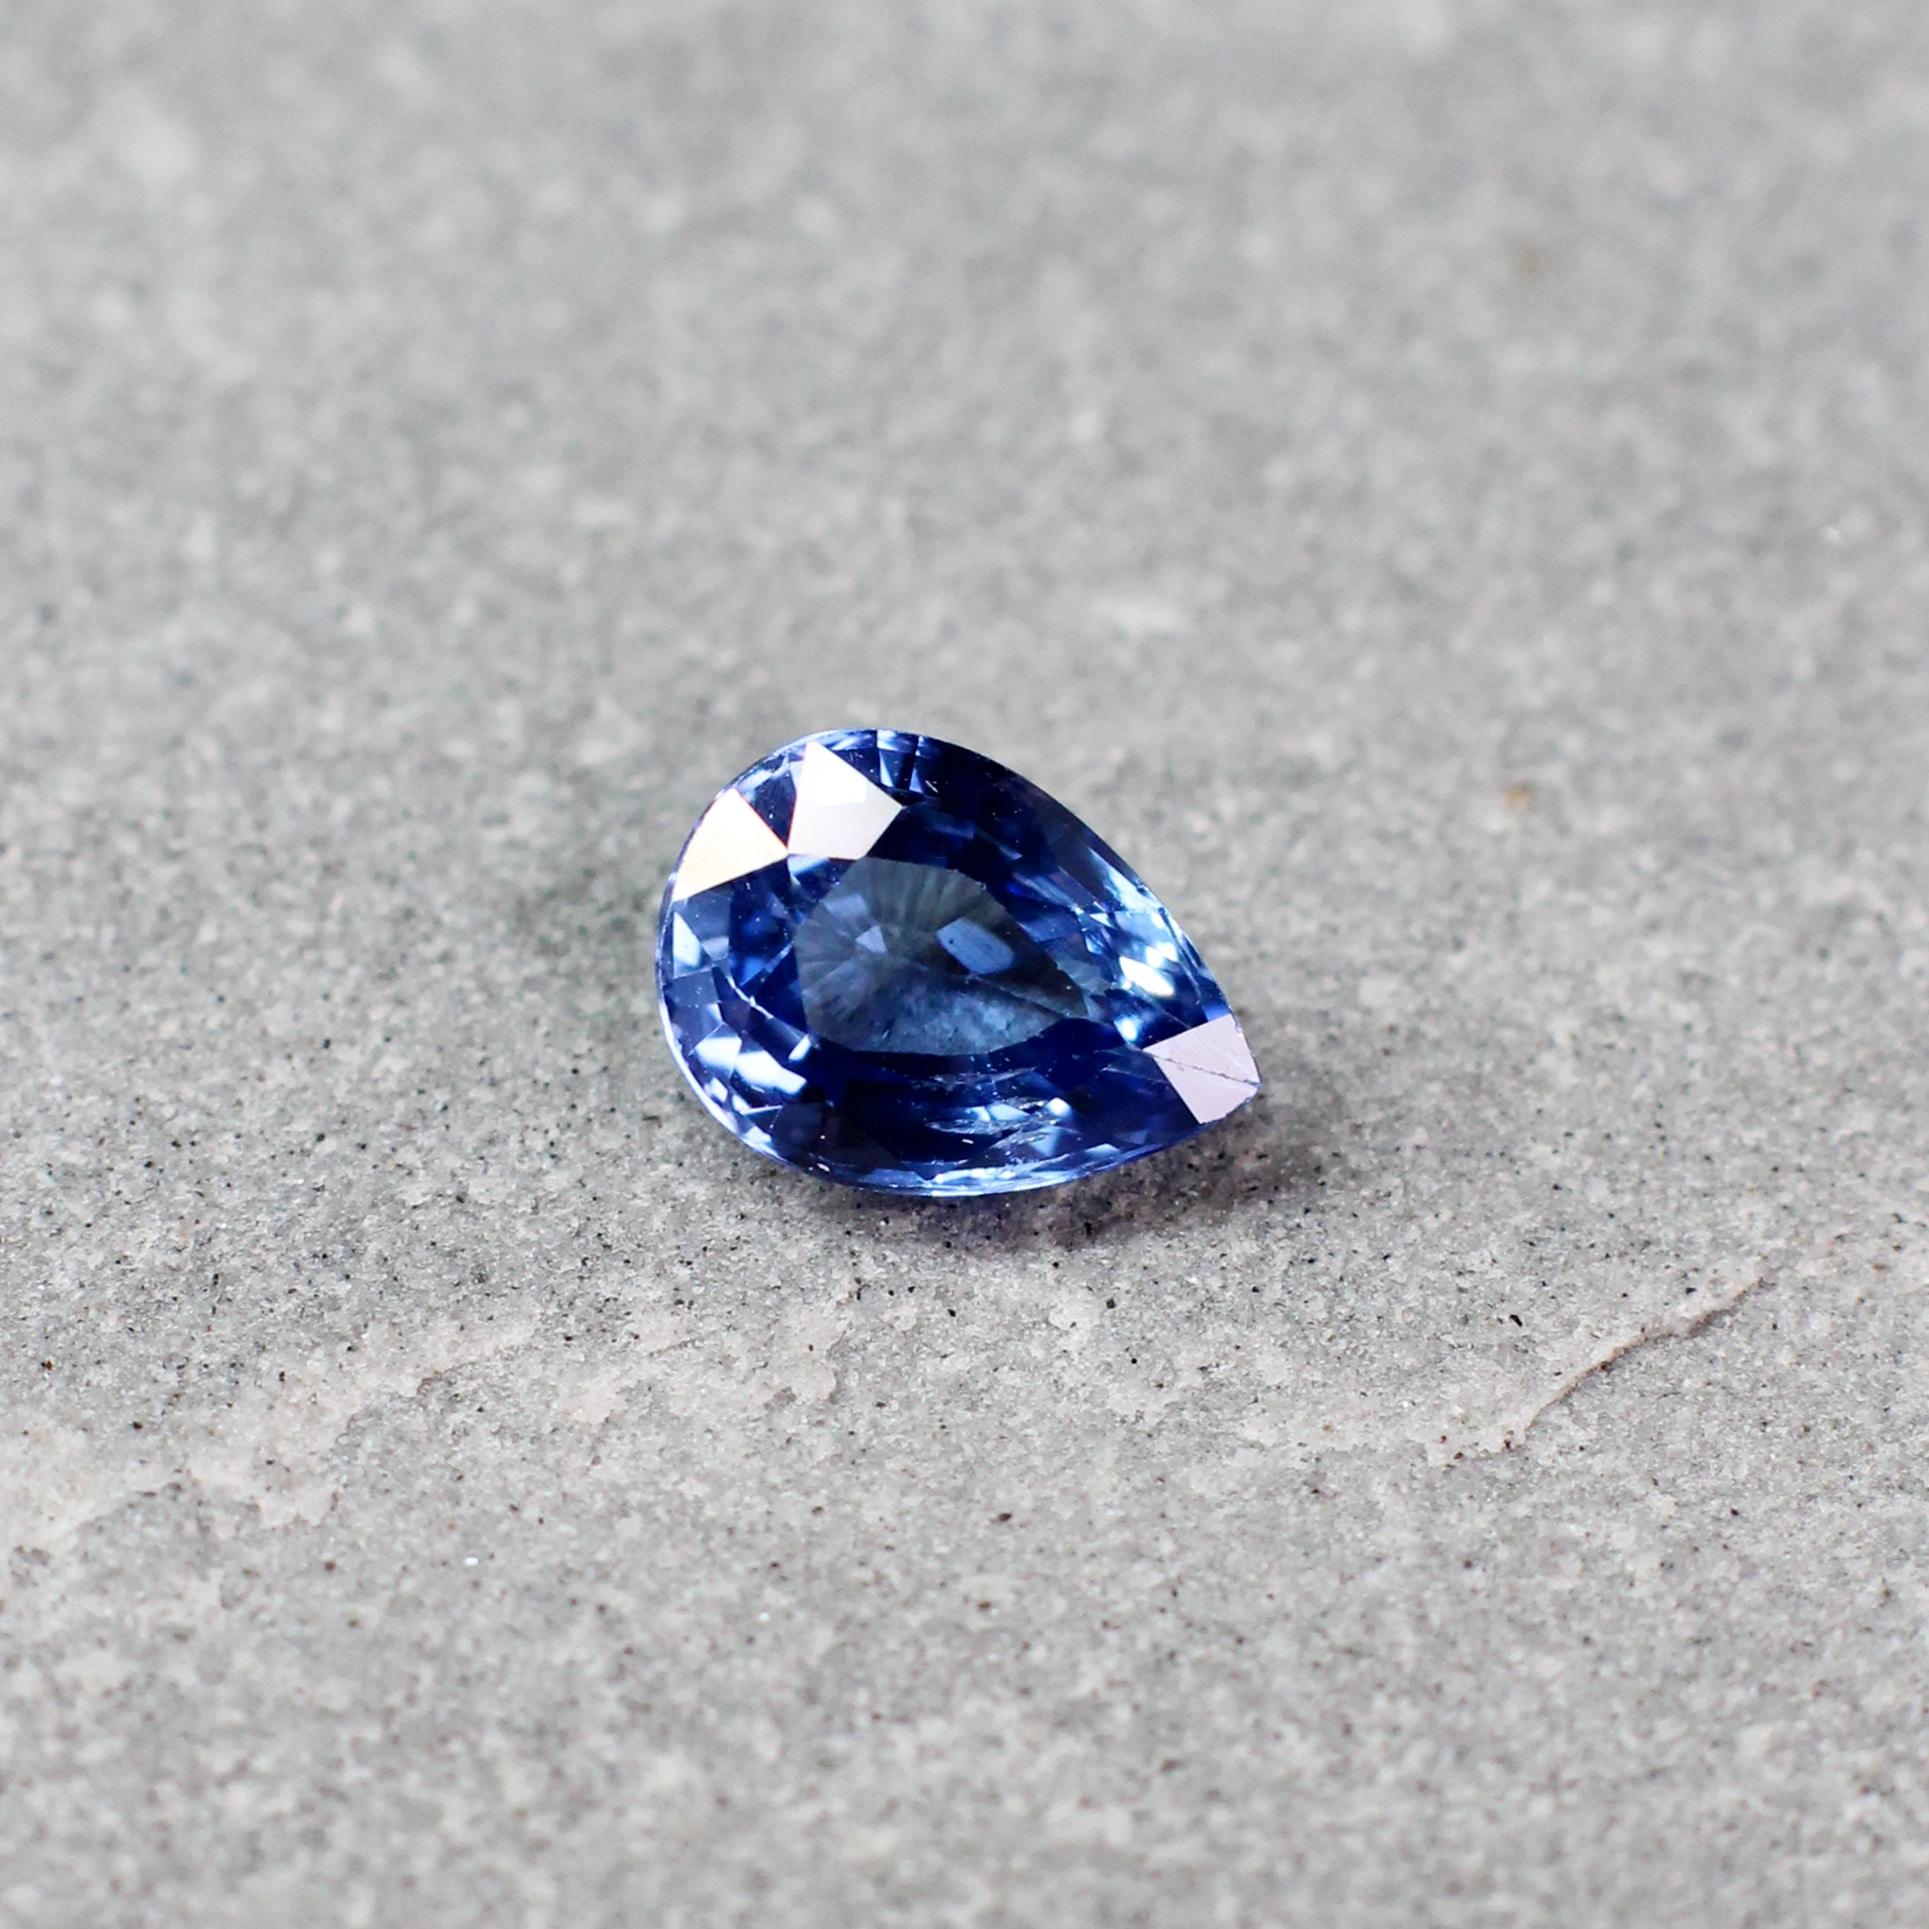 1.00 ct blue pear shape sapphire